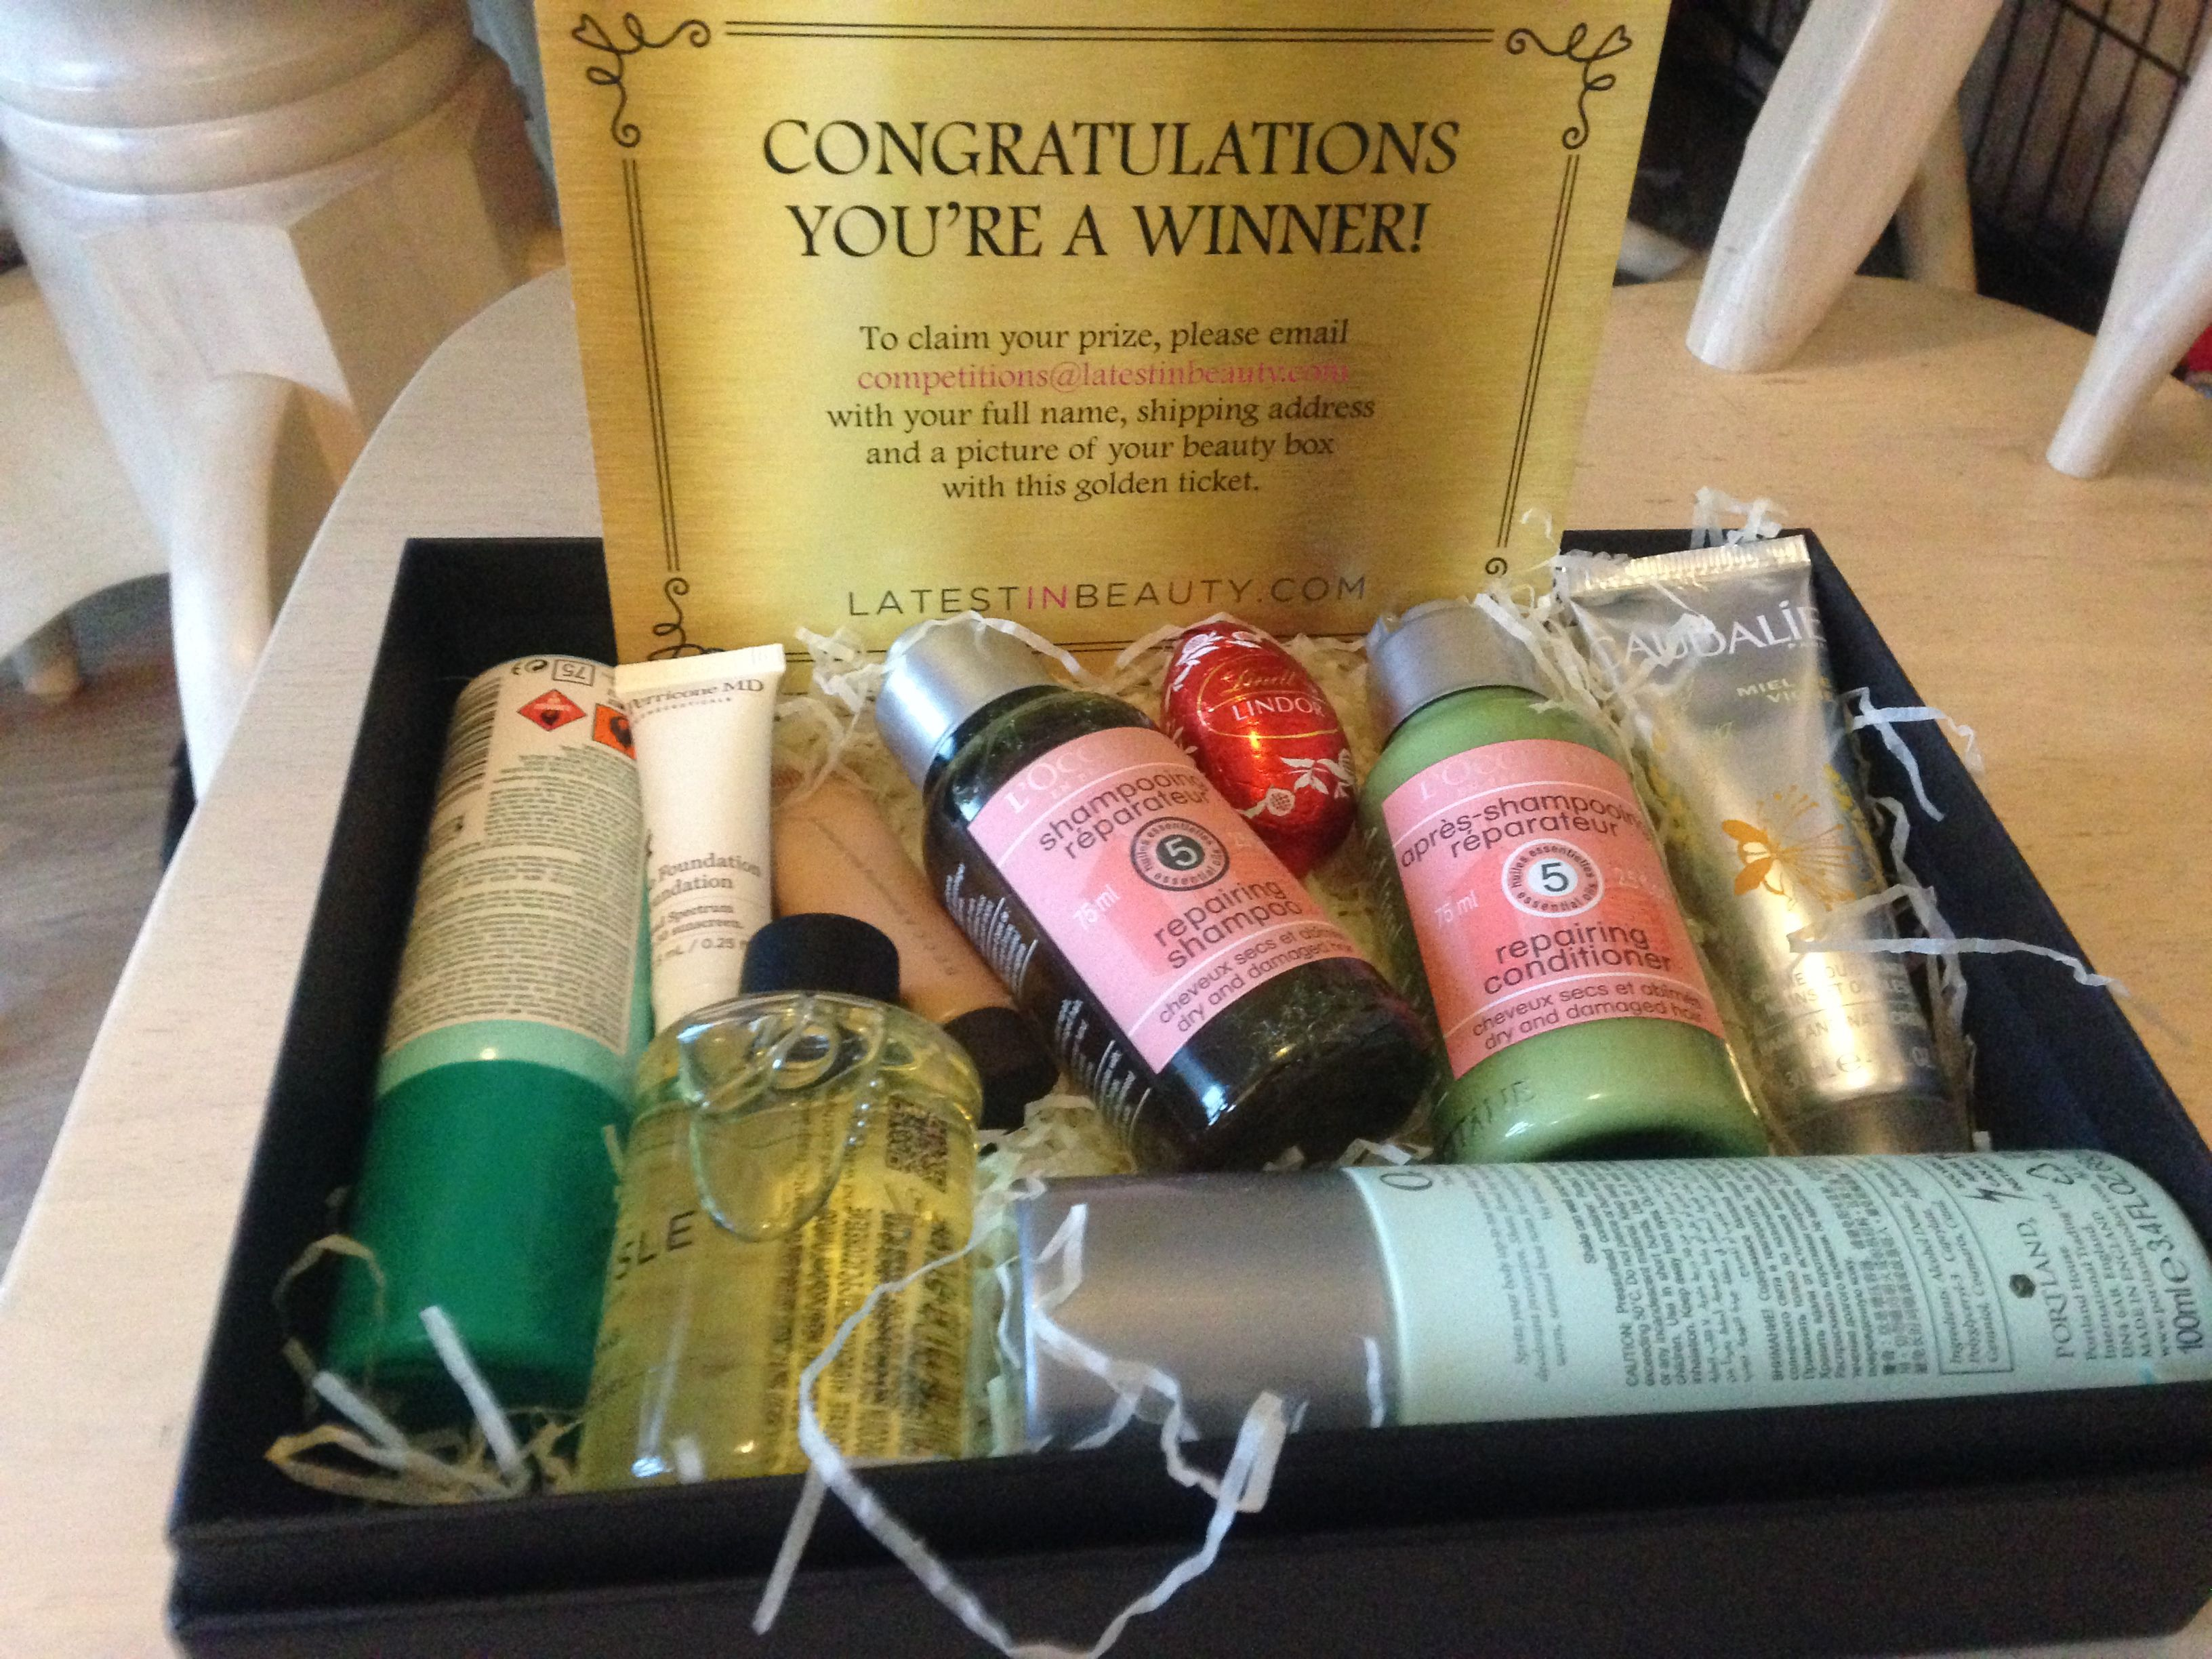 Congratulations Victoria! #GoldenTicket #Whatsinyourbeautybox? #Latestinbeauty